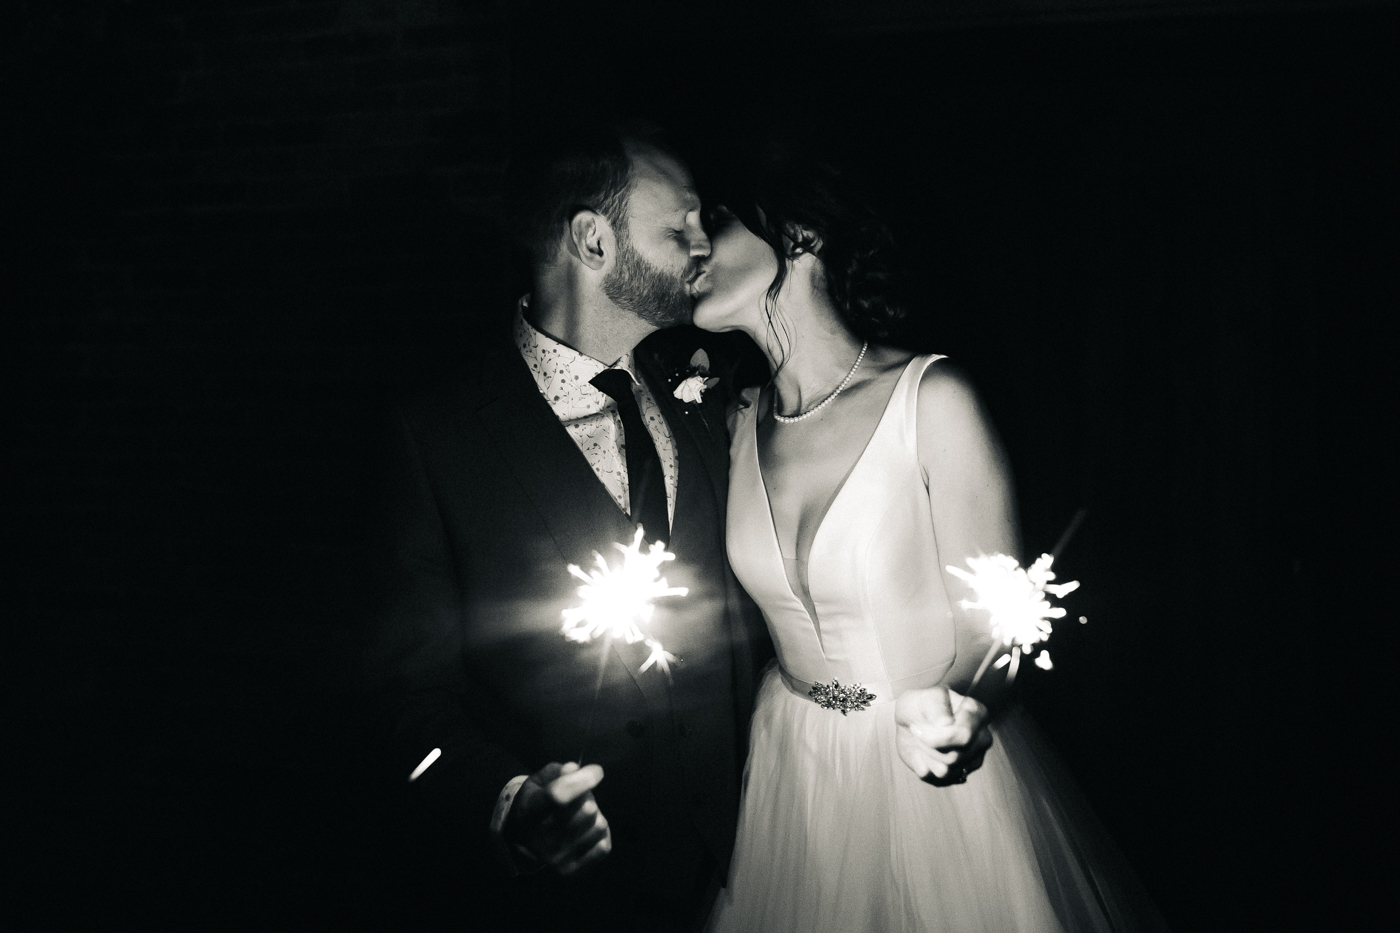 york-house-malton-wedding-photographer-north-yorkshire-0042.jpg